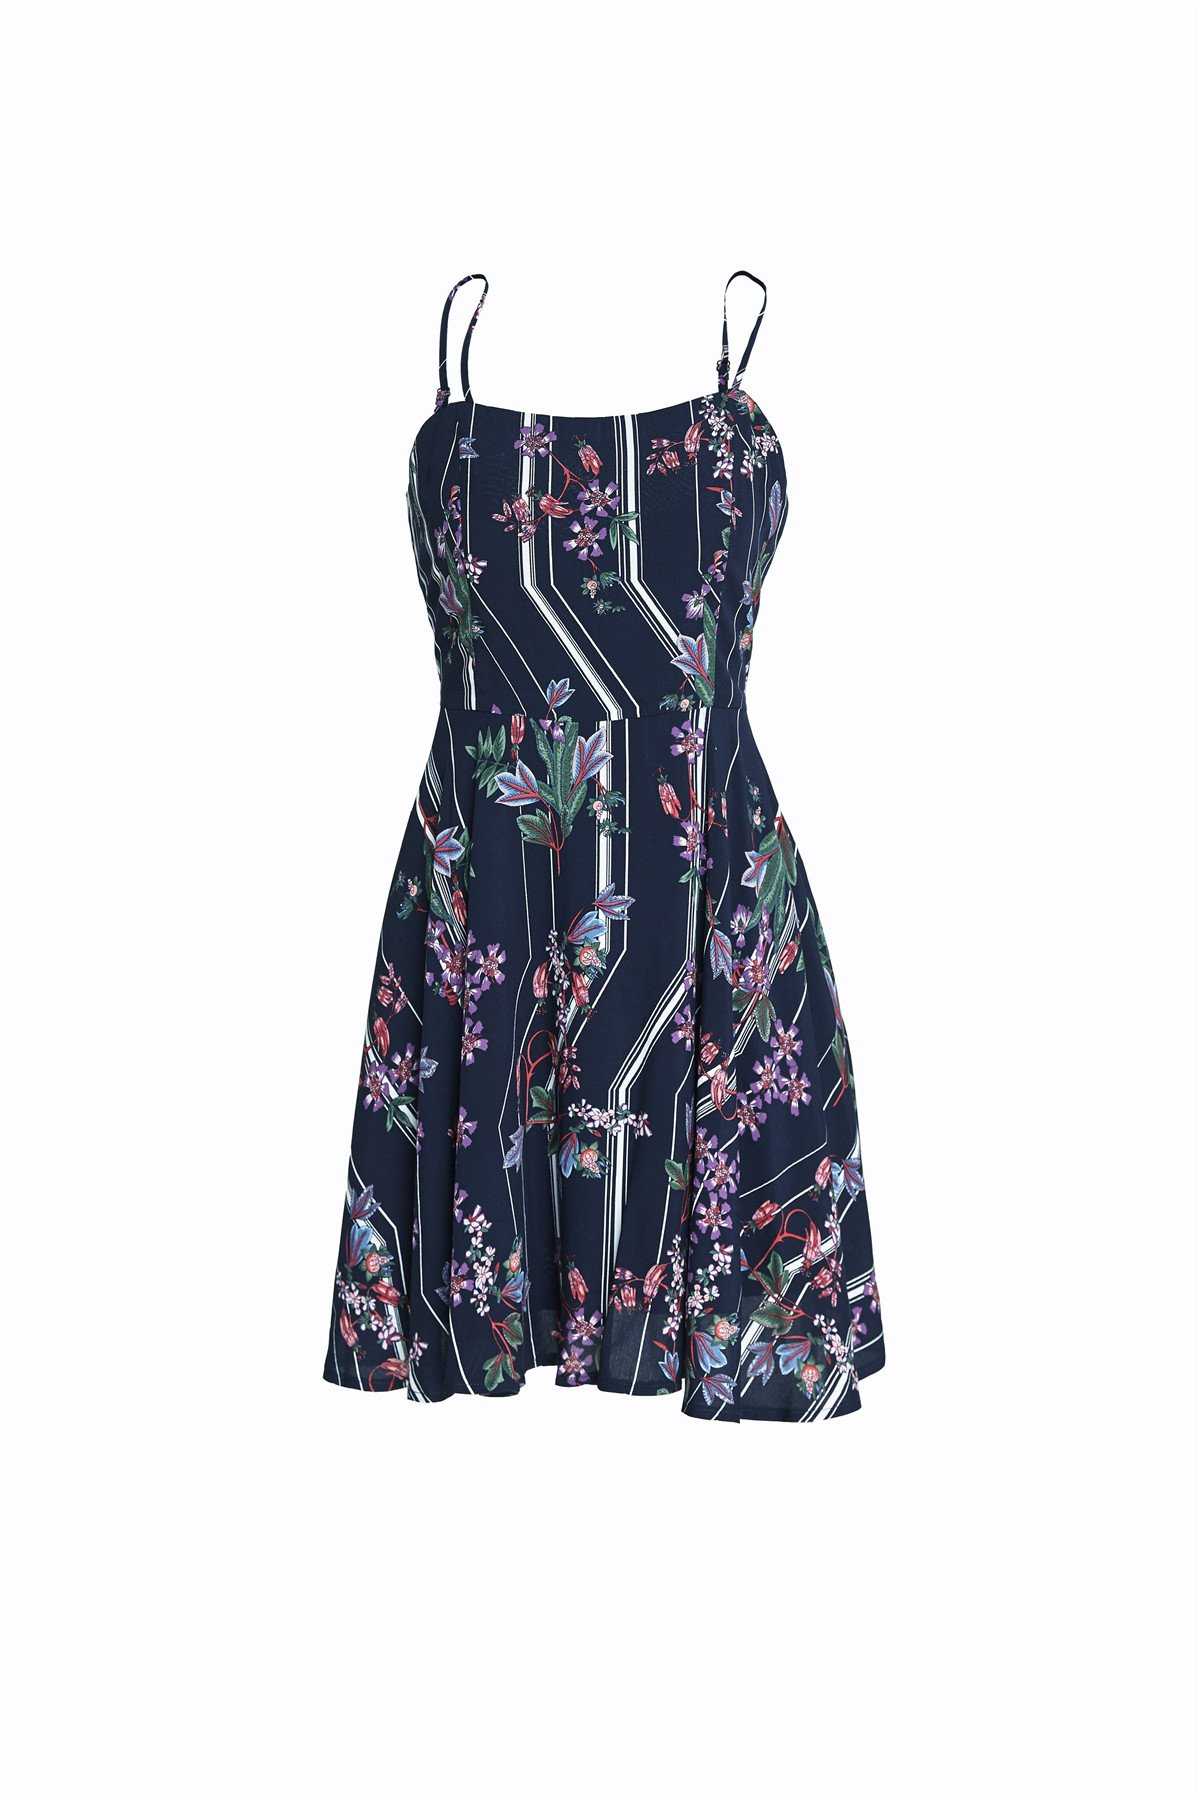 SUWIINA Women\'s Sleeveless Spaghetti Strap Beach Floral Printed Mini Short Dress Blue